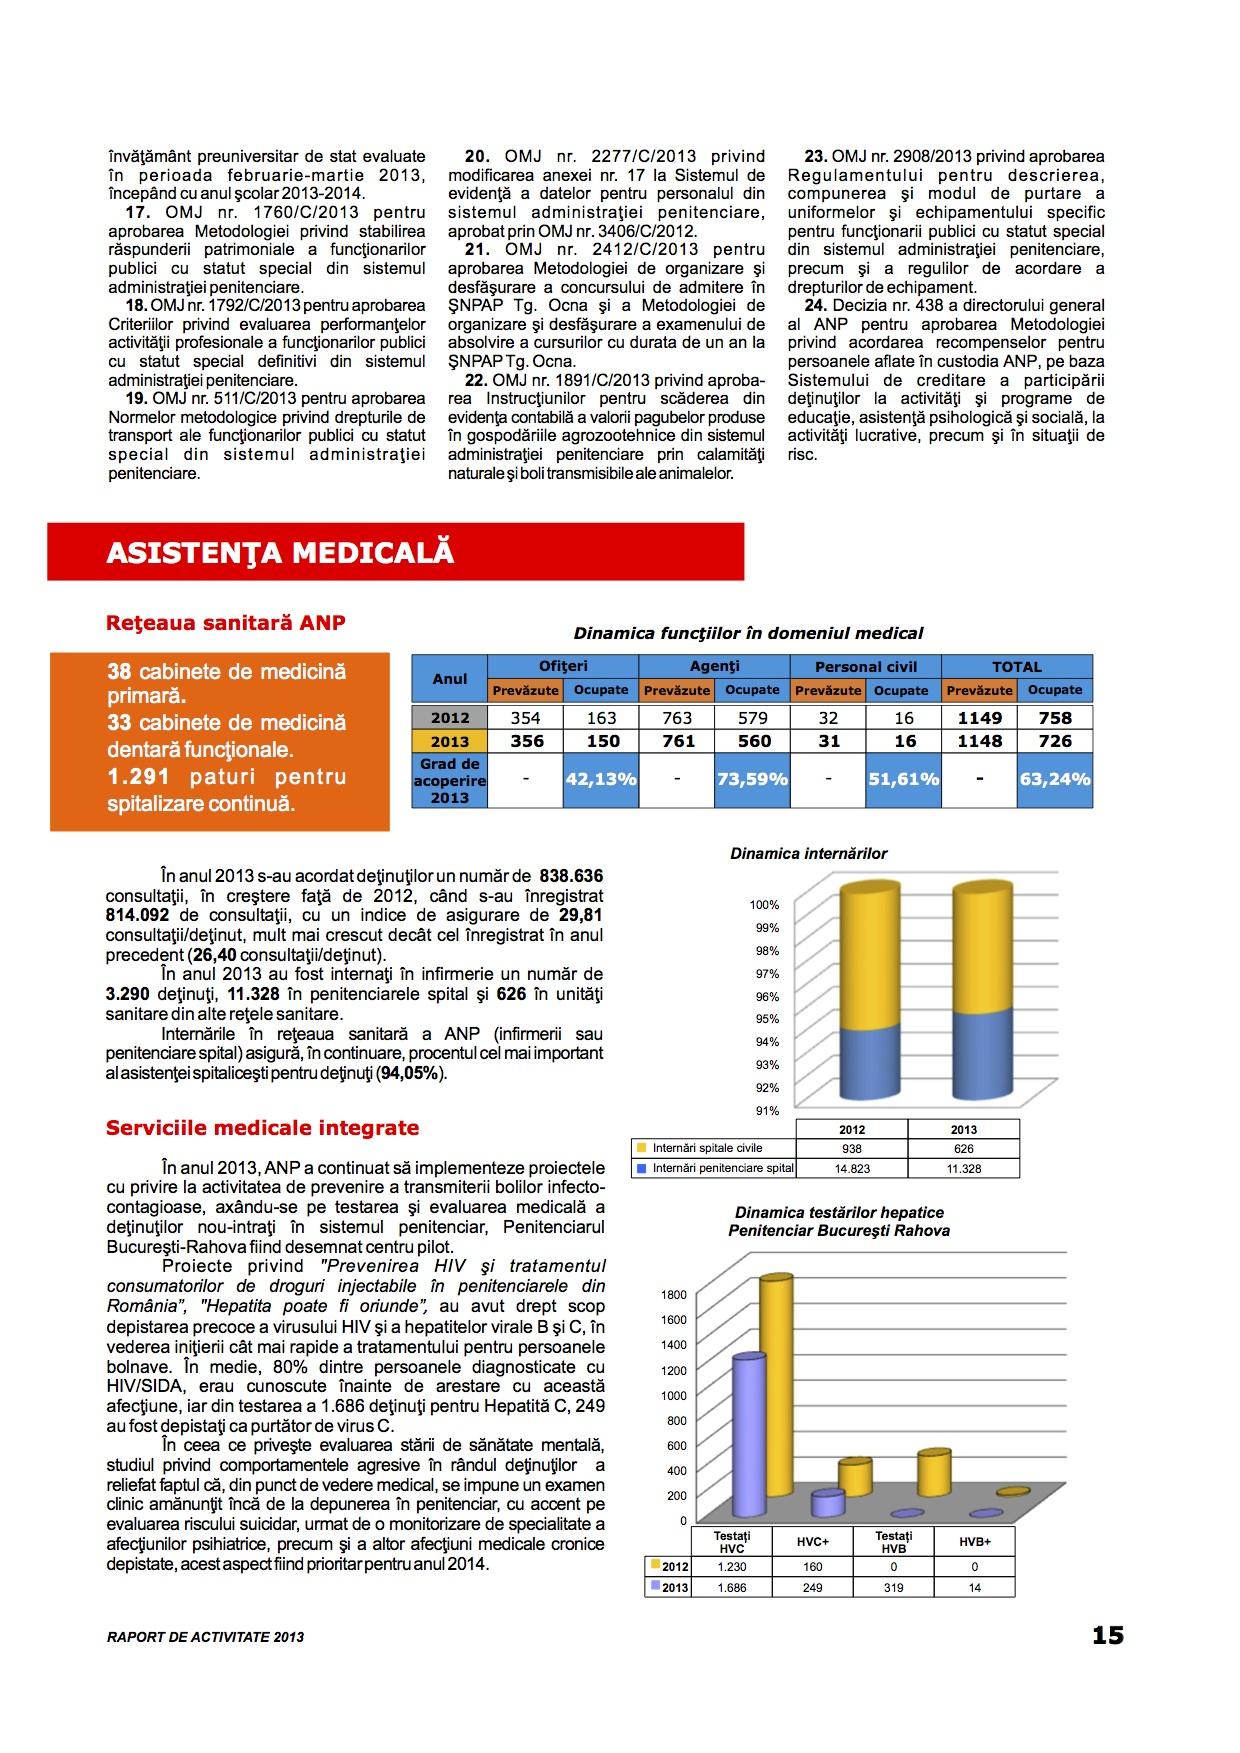 bilant 2013pg15